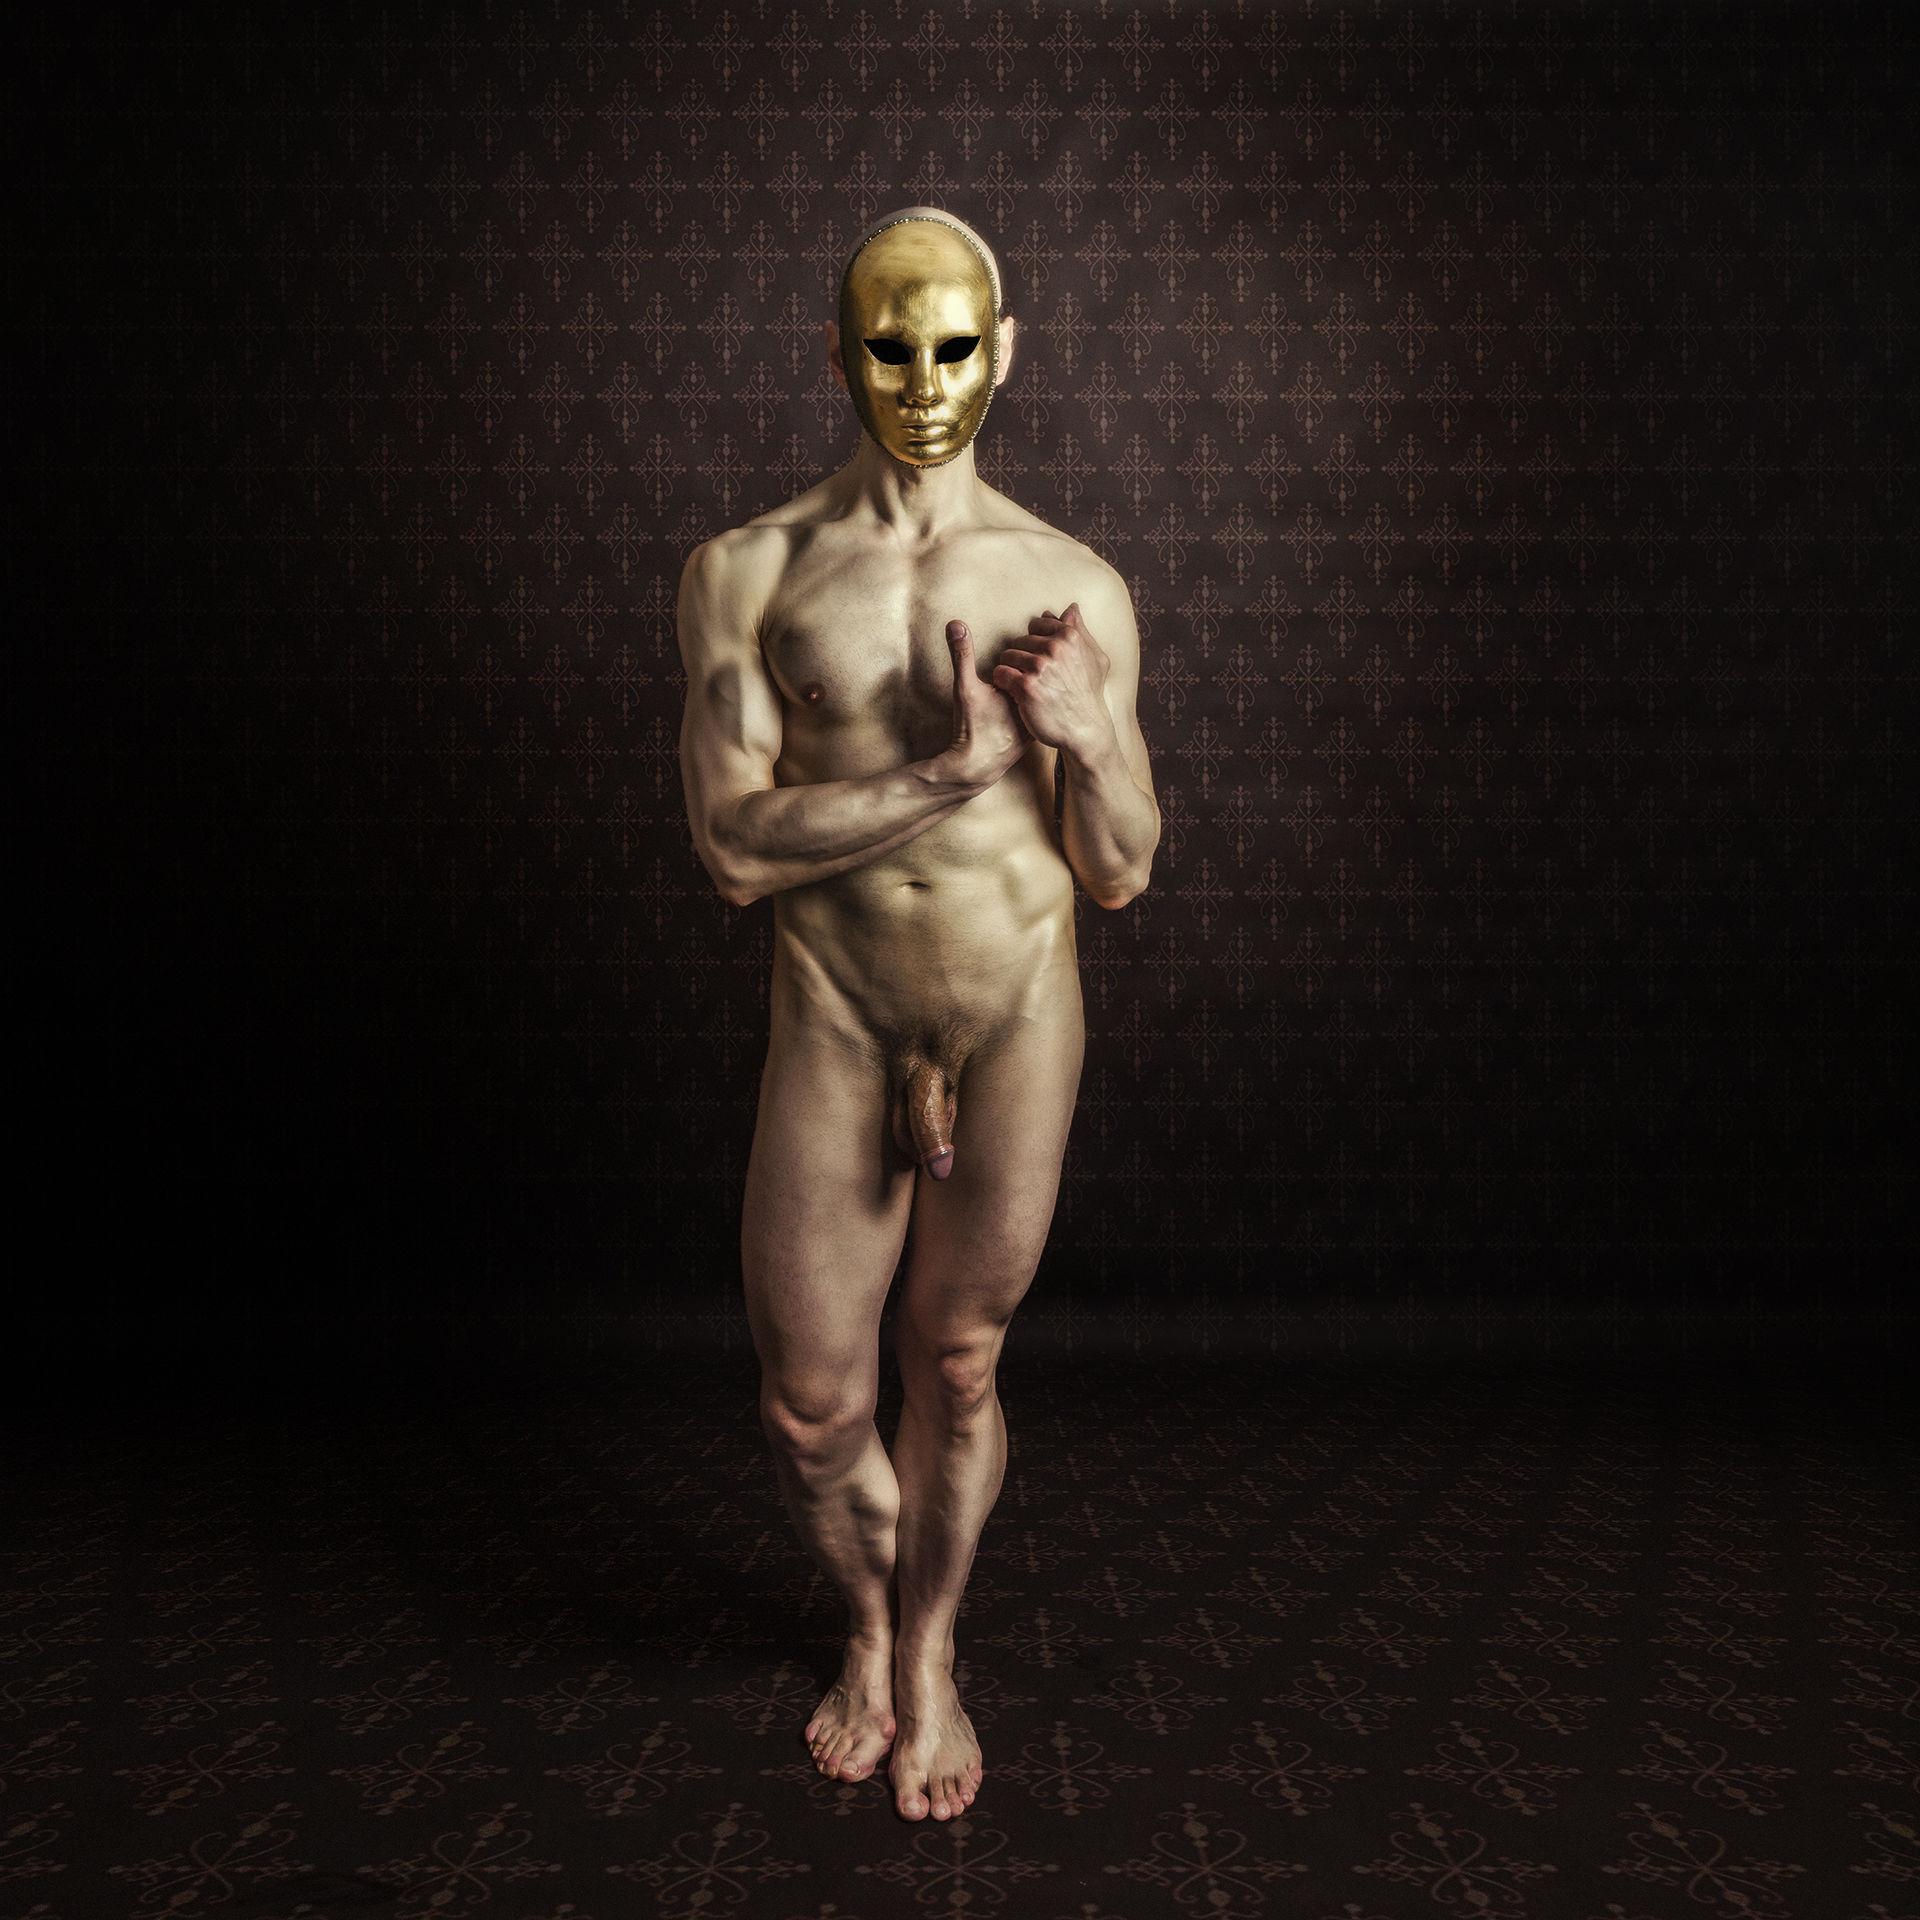 Masked Heroes: Hidden Regality